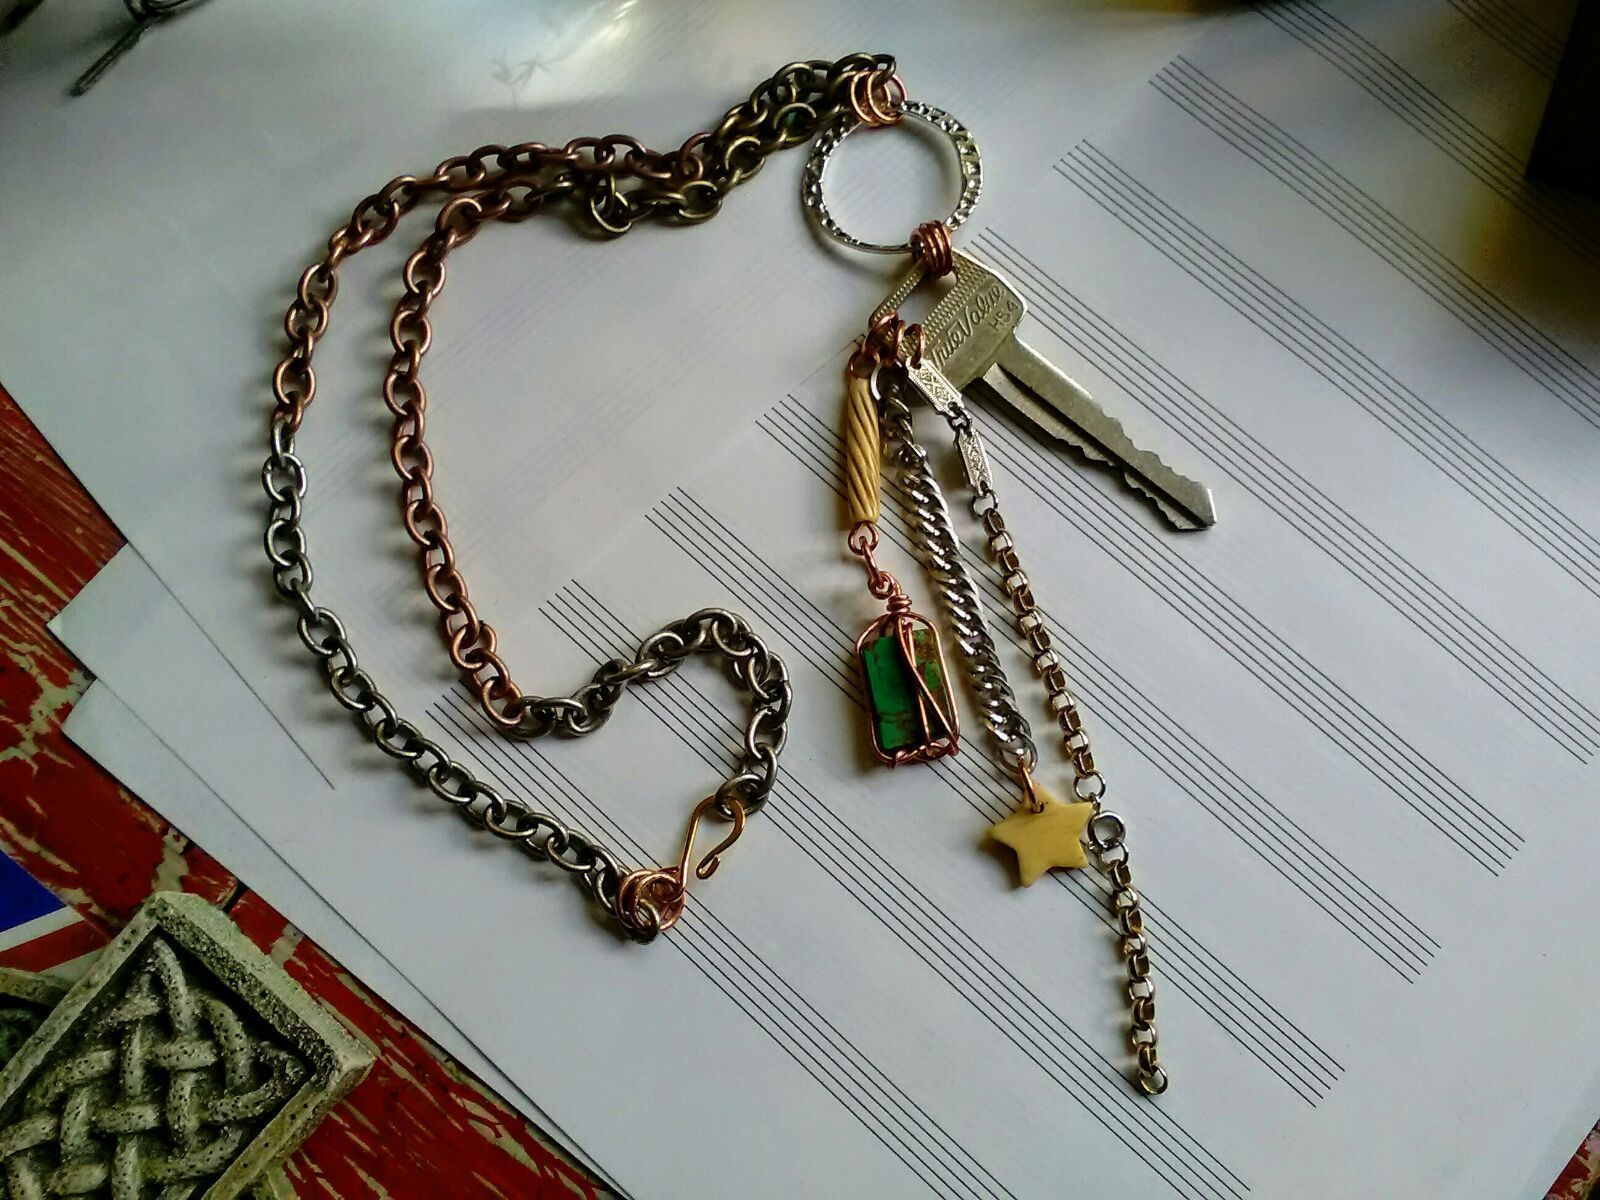 Handmade Key & Turquoise Charm Necklace